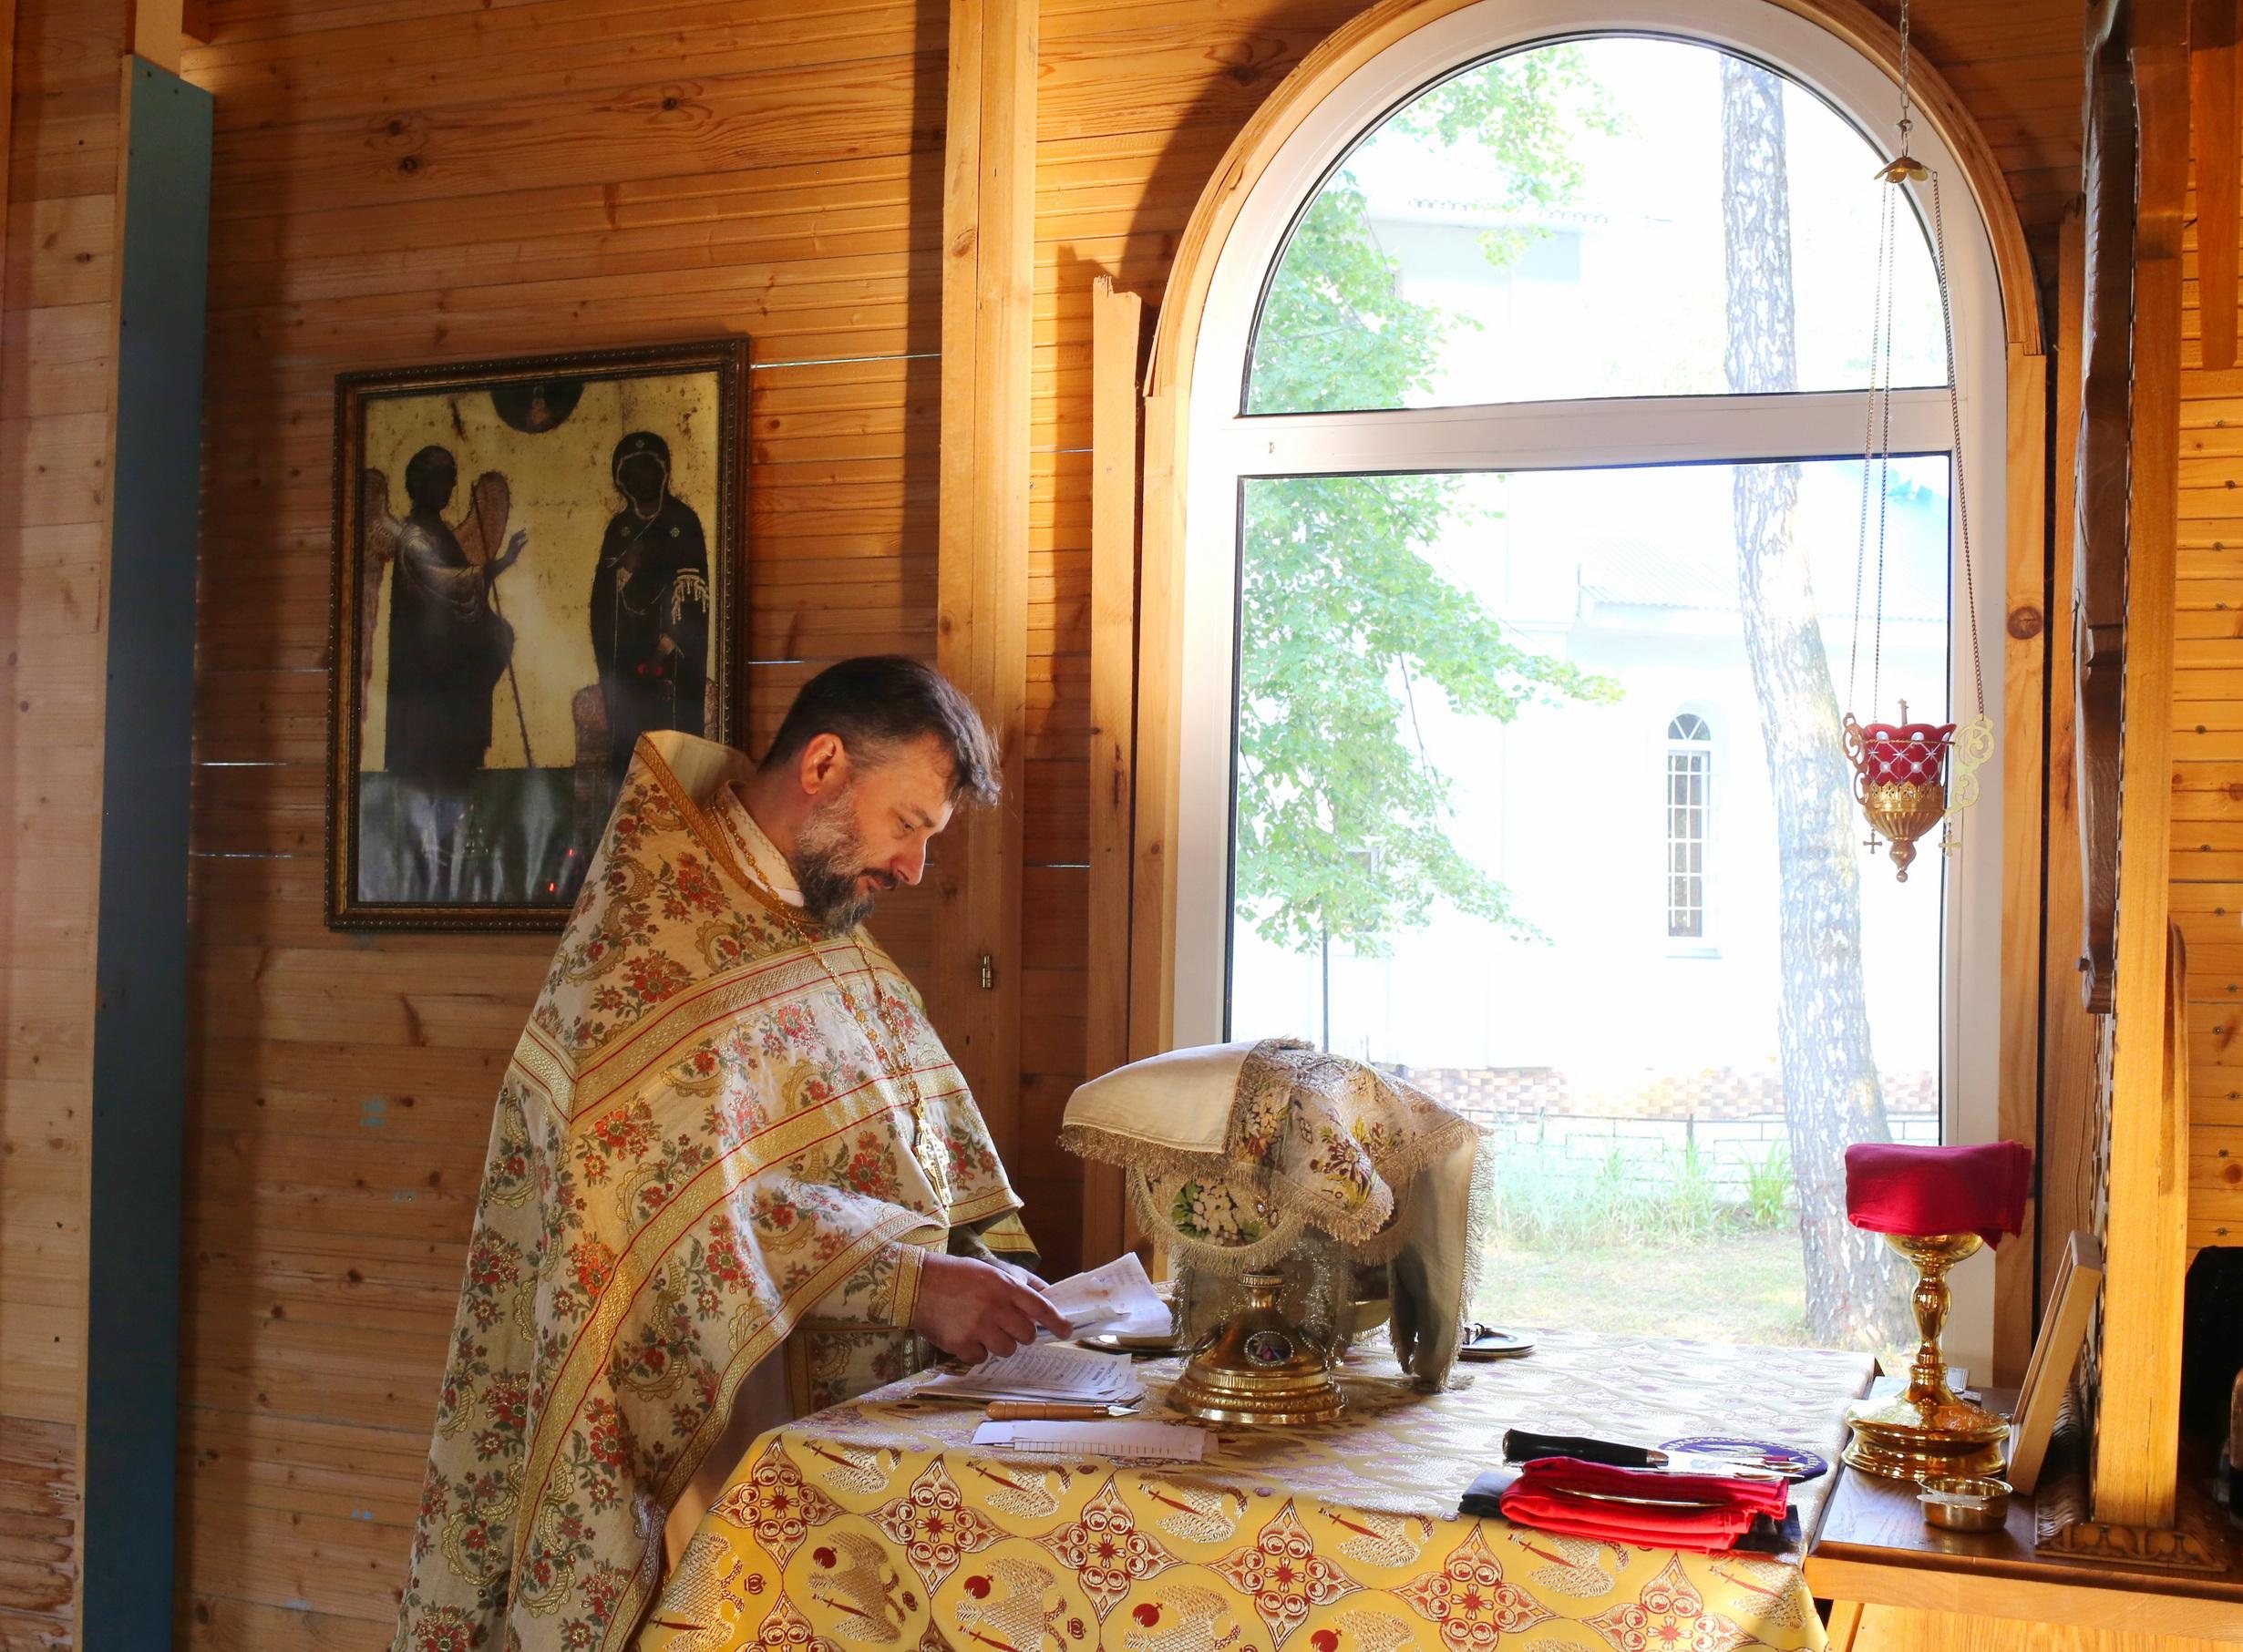 http://monuspen.ru/photoreports/3ebb0669ac05753d230129a8edd85479.JPG